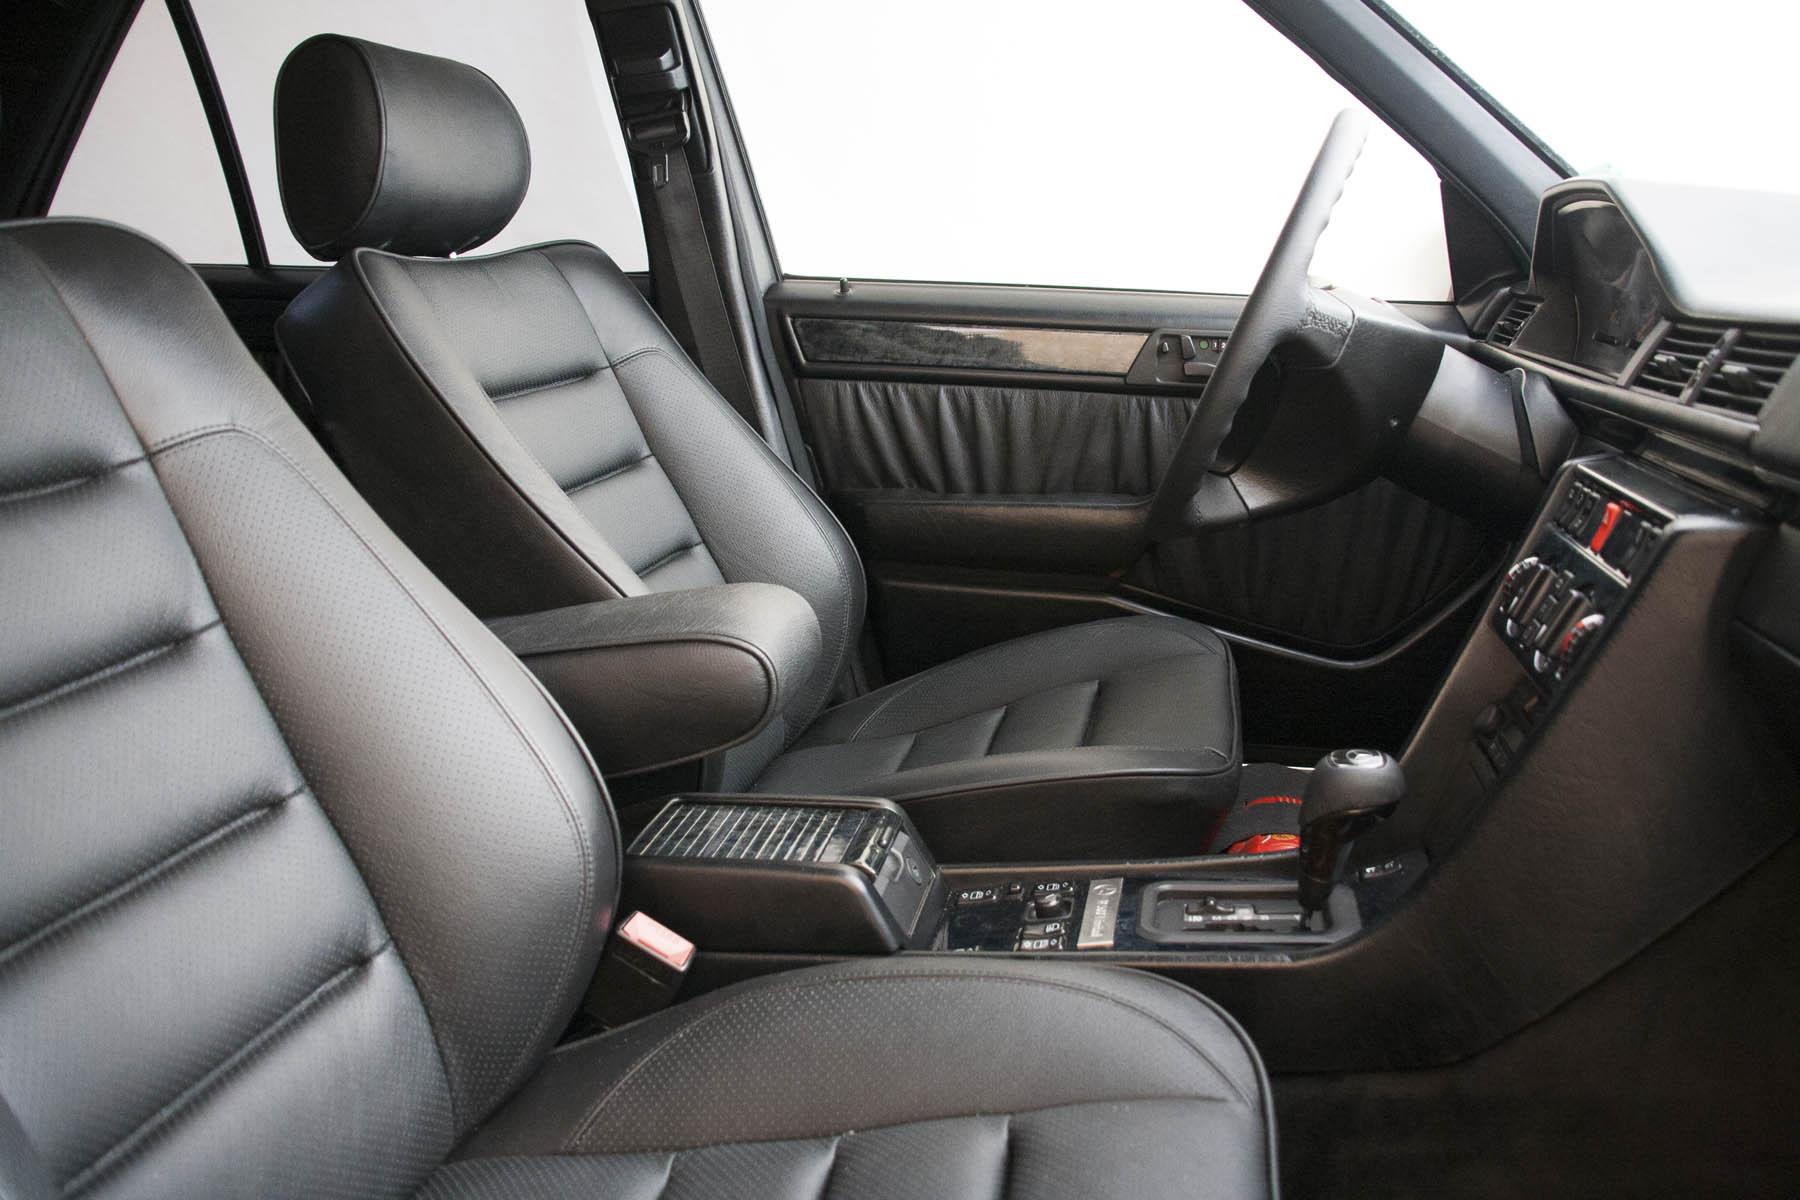 04 Mercedes E60 AMG